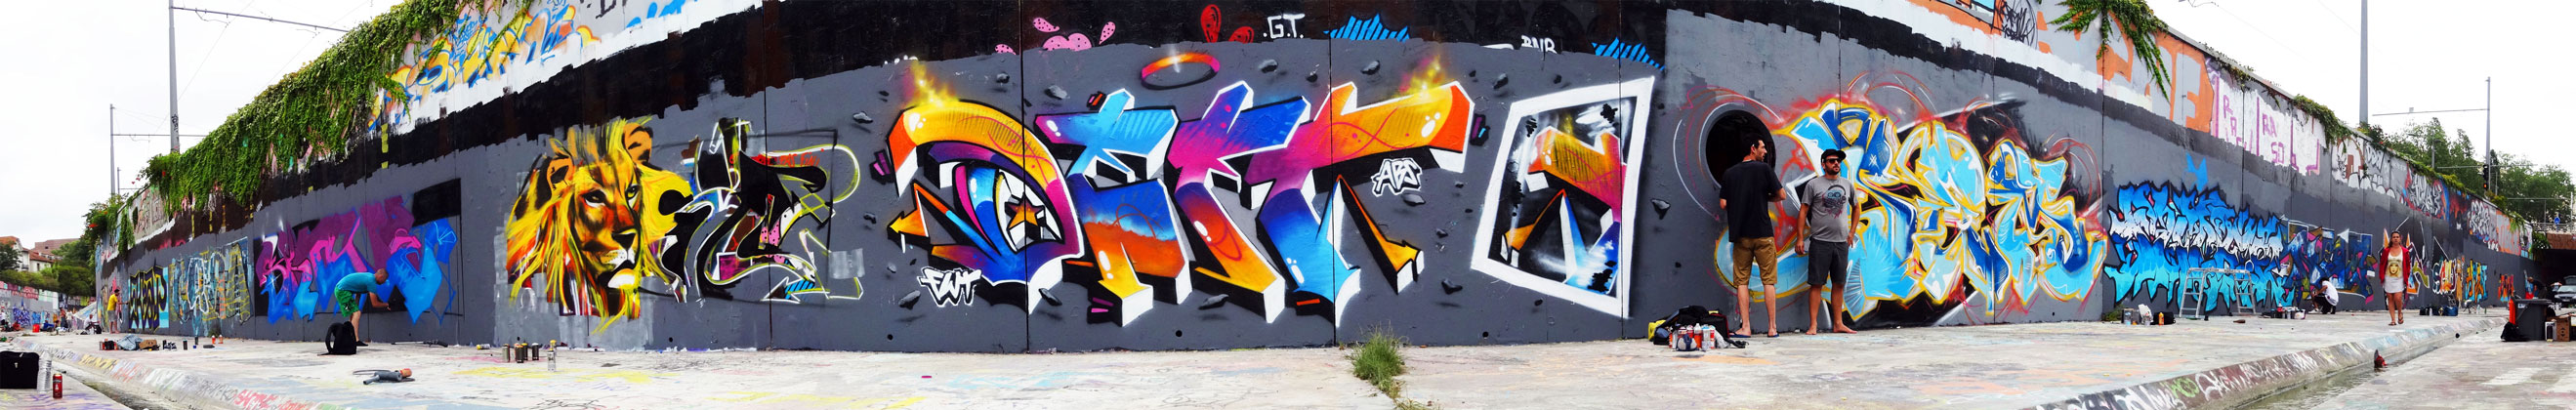 2014_08_fresque_deft_monpellier_canal_2